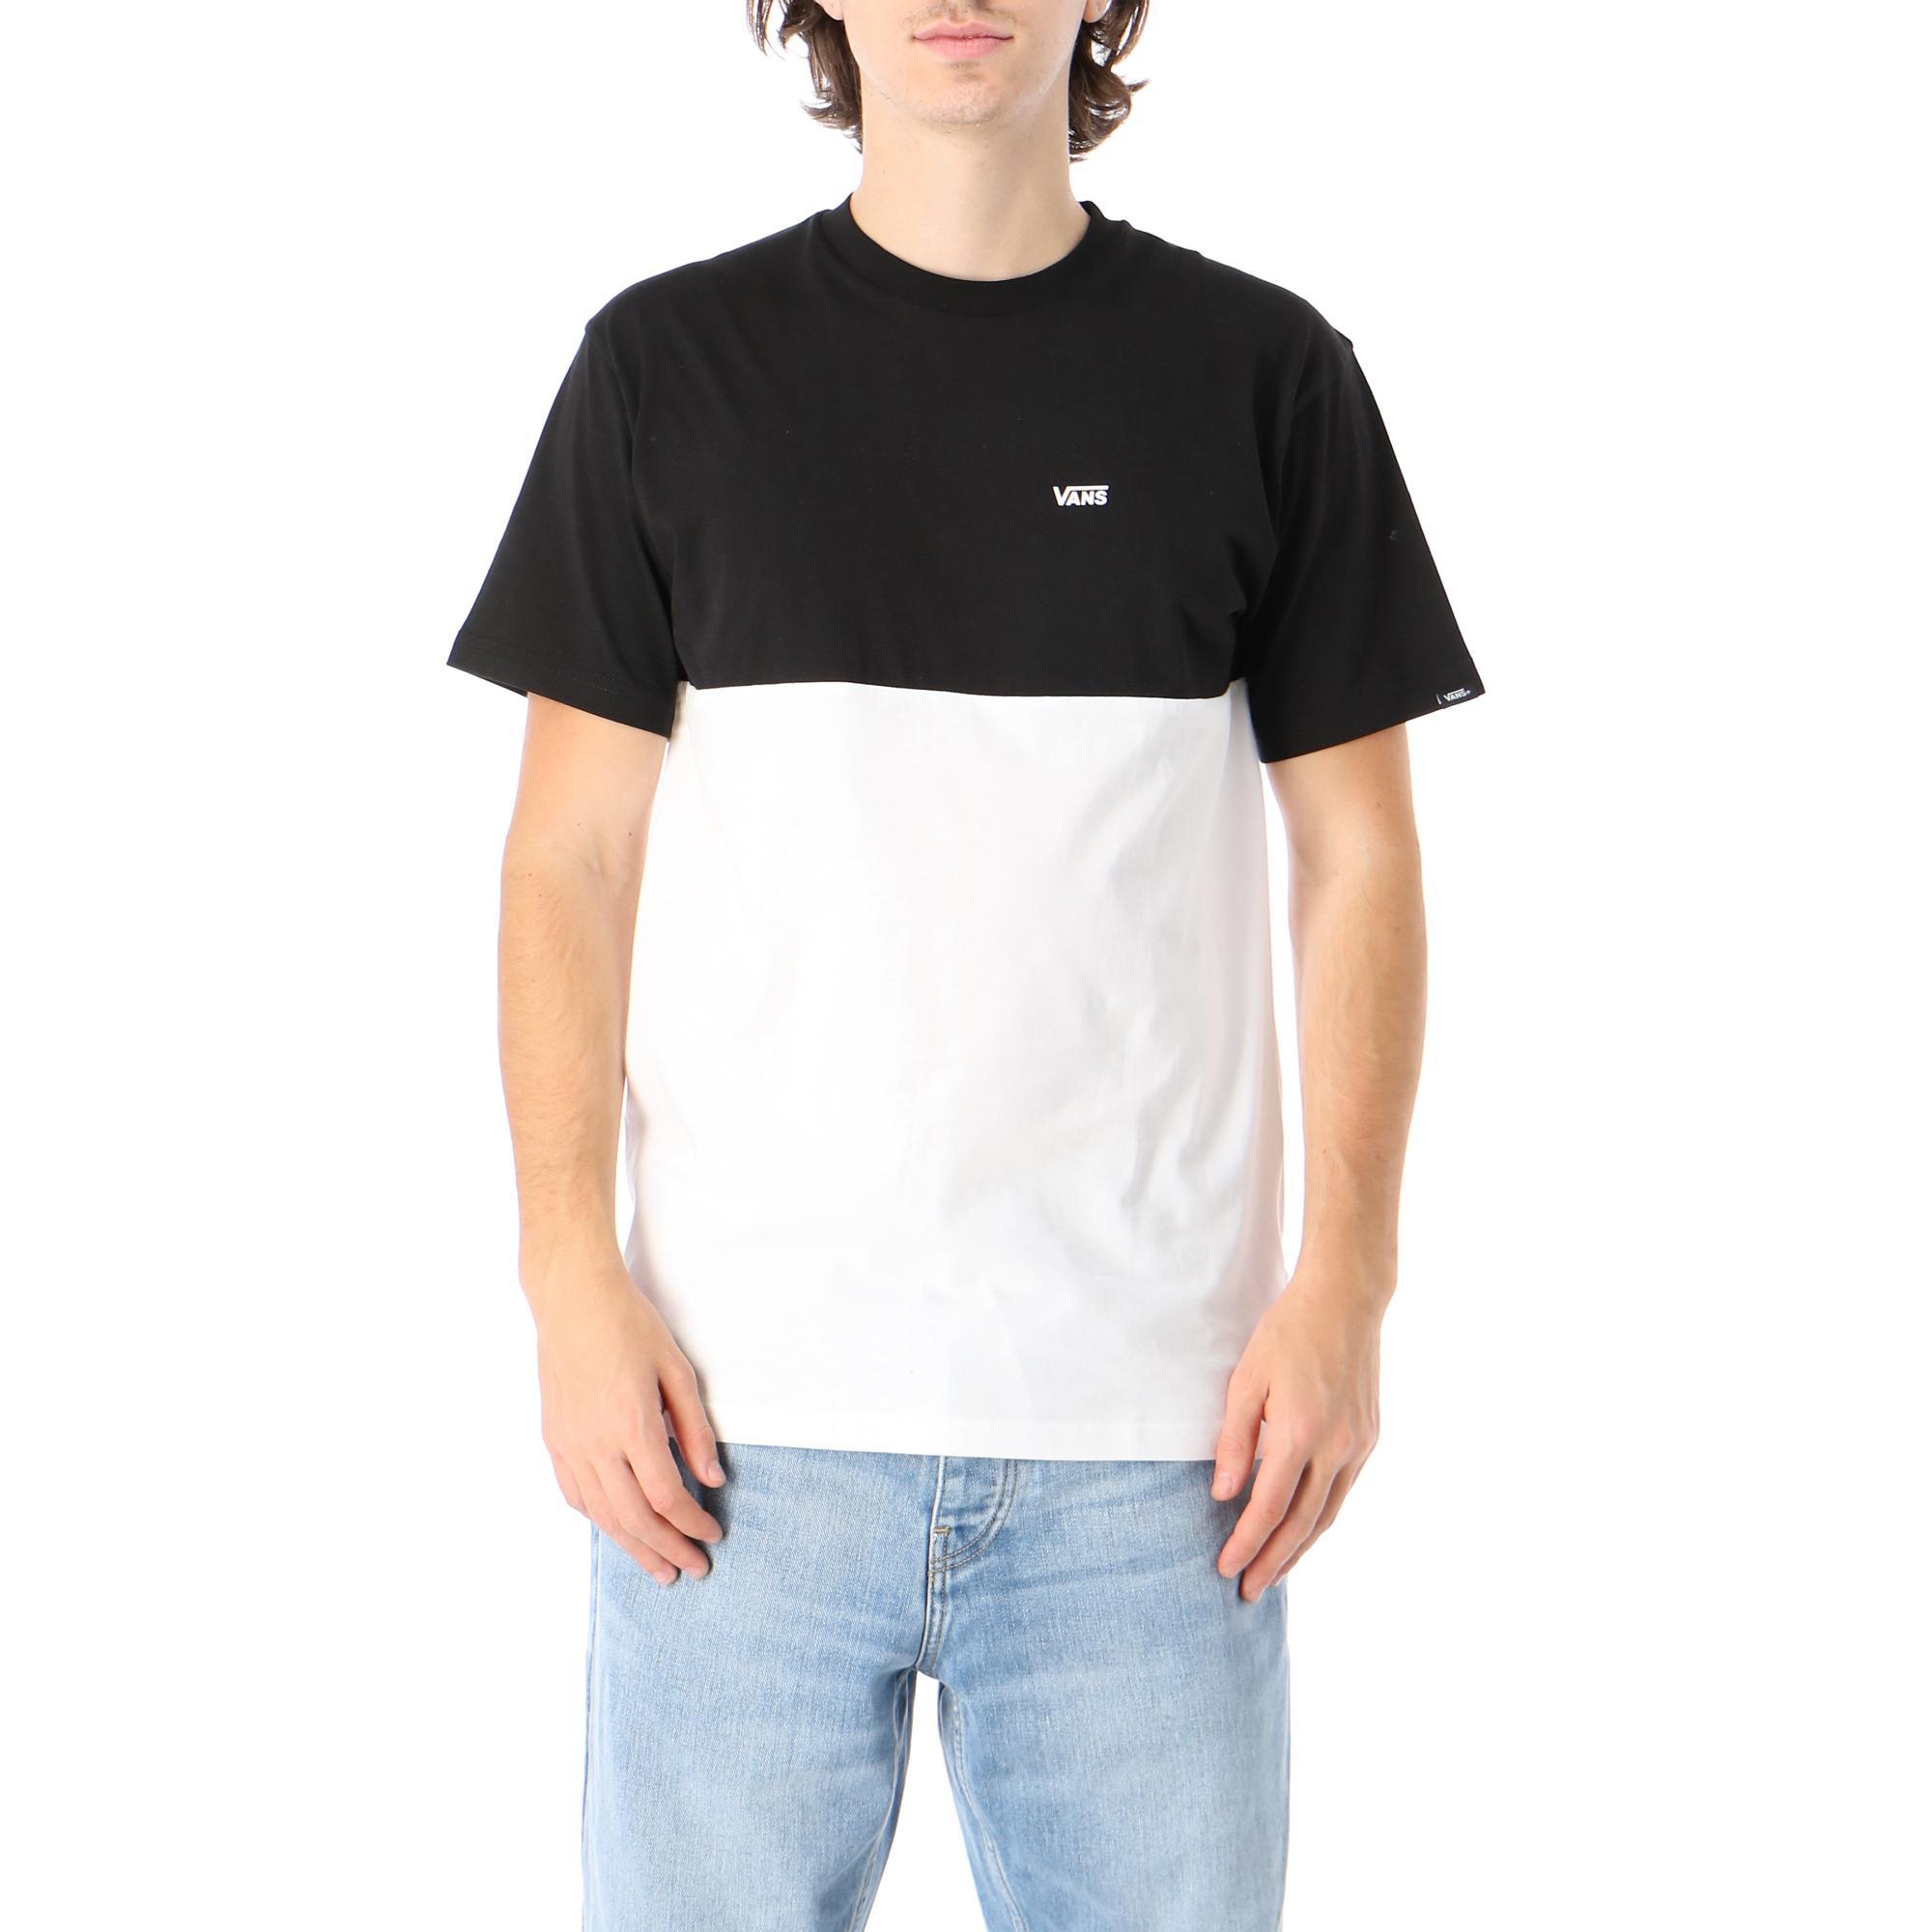 Vans Mn Colorblock Tee White black